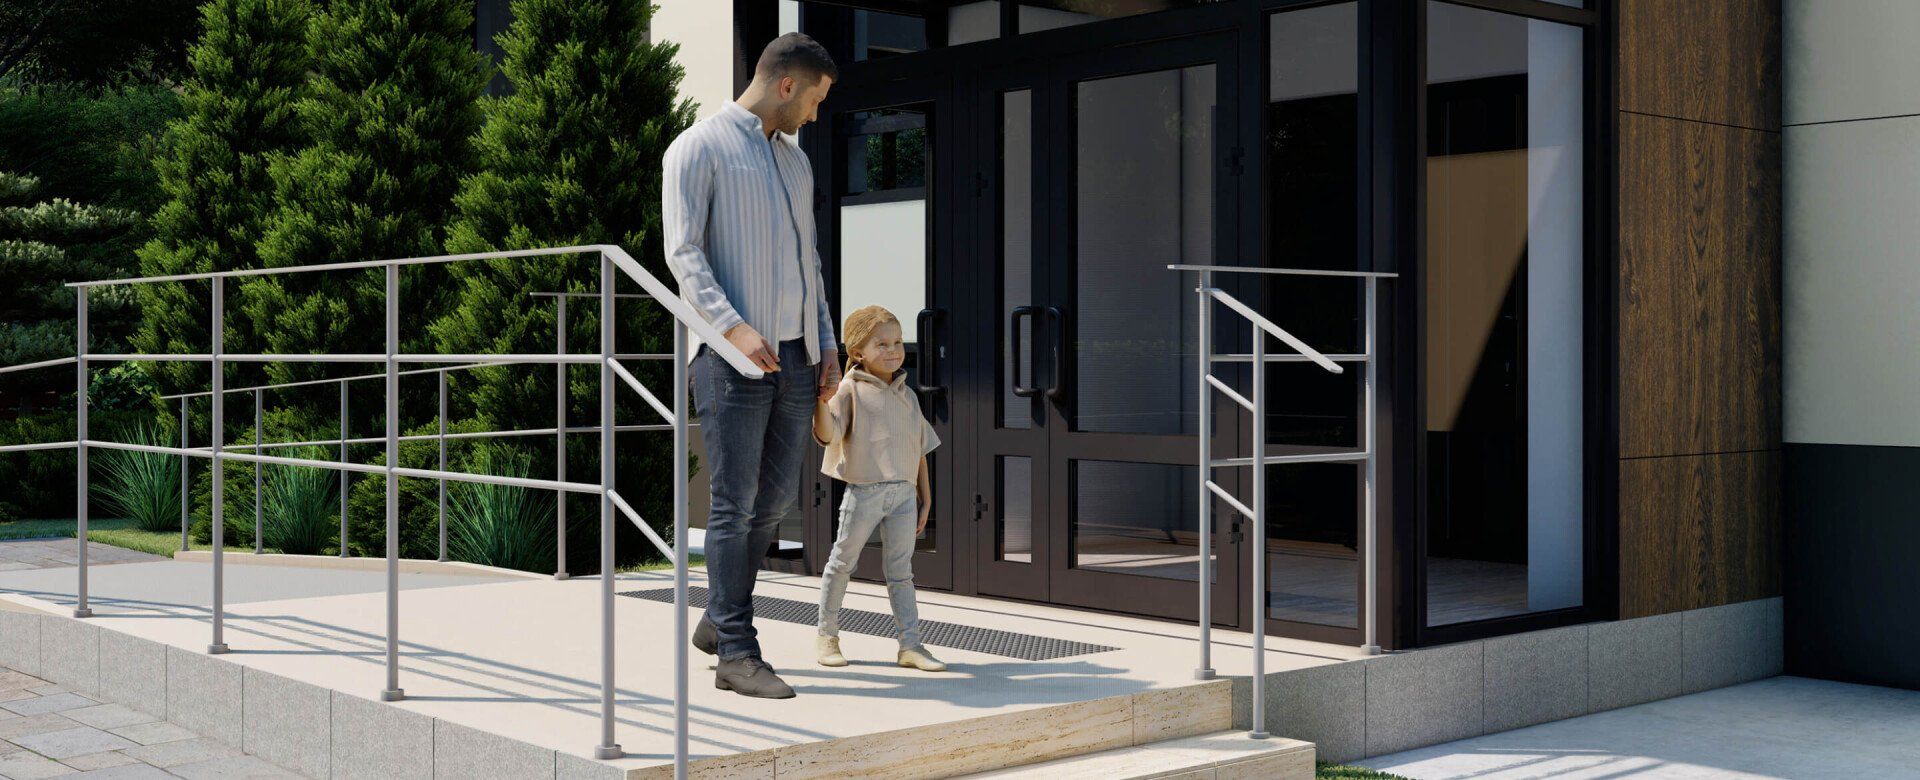 Прогулки с ребенком на свежем воздухе